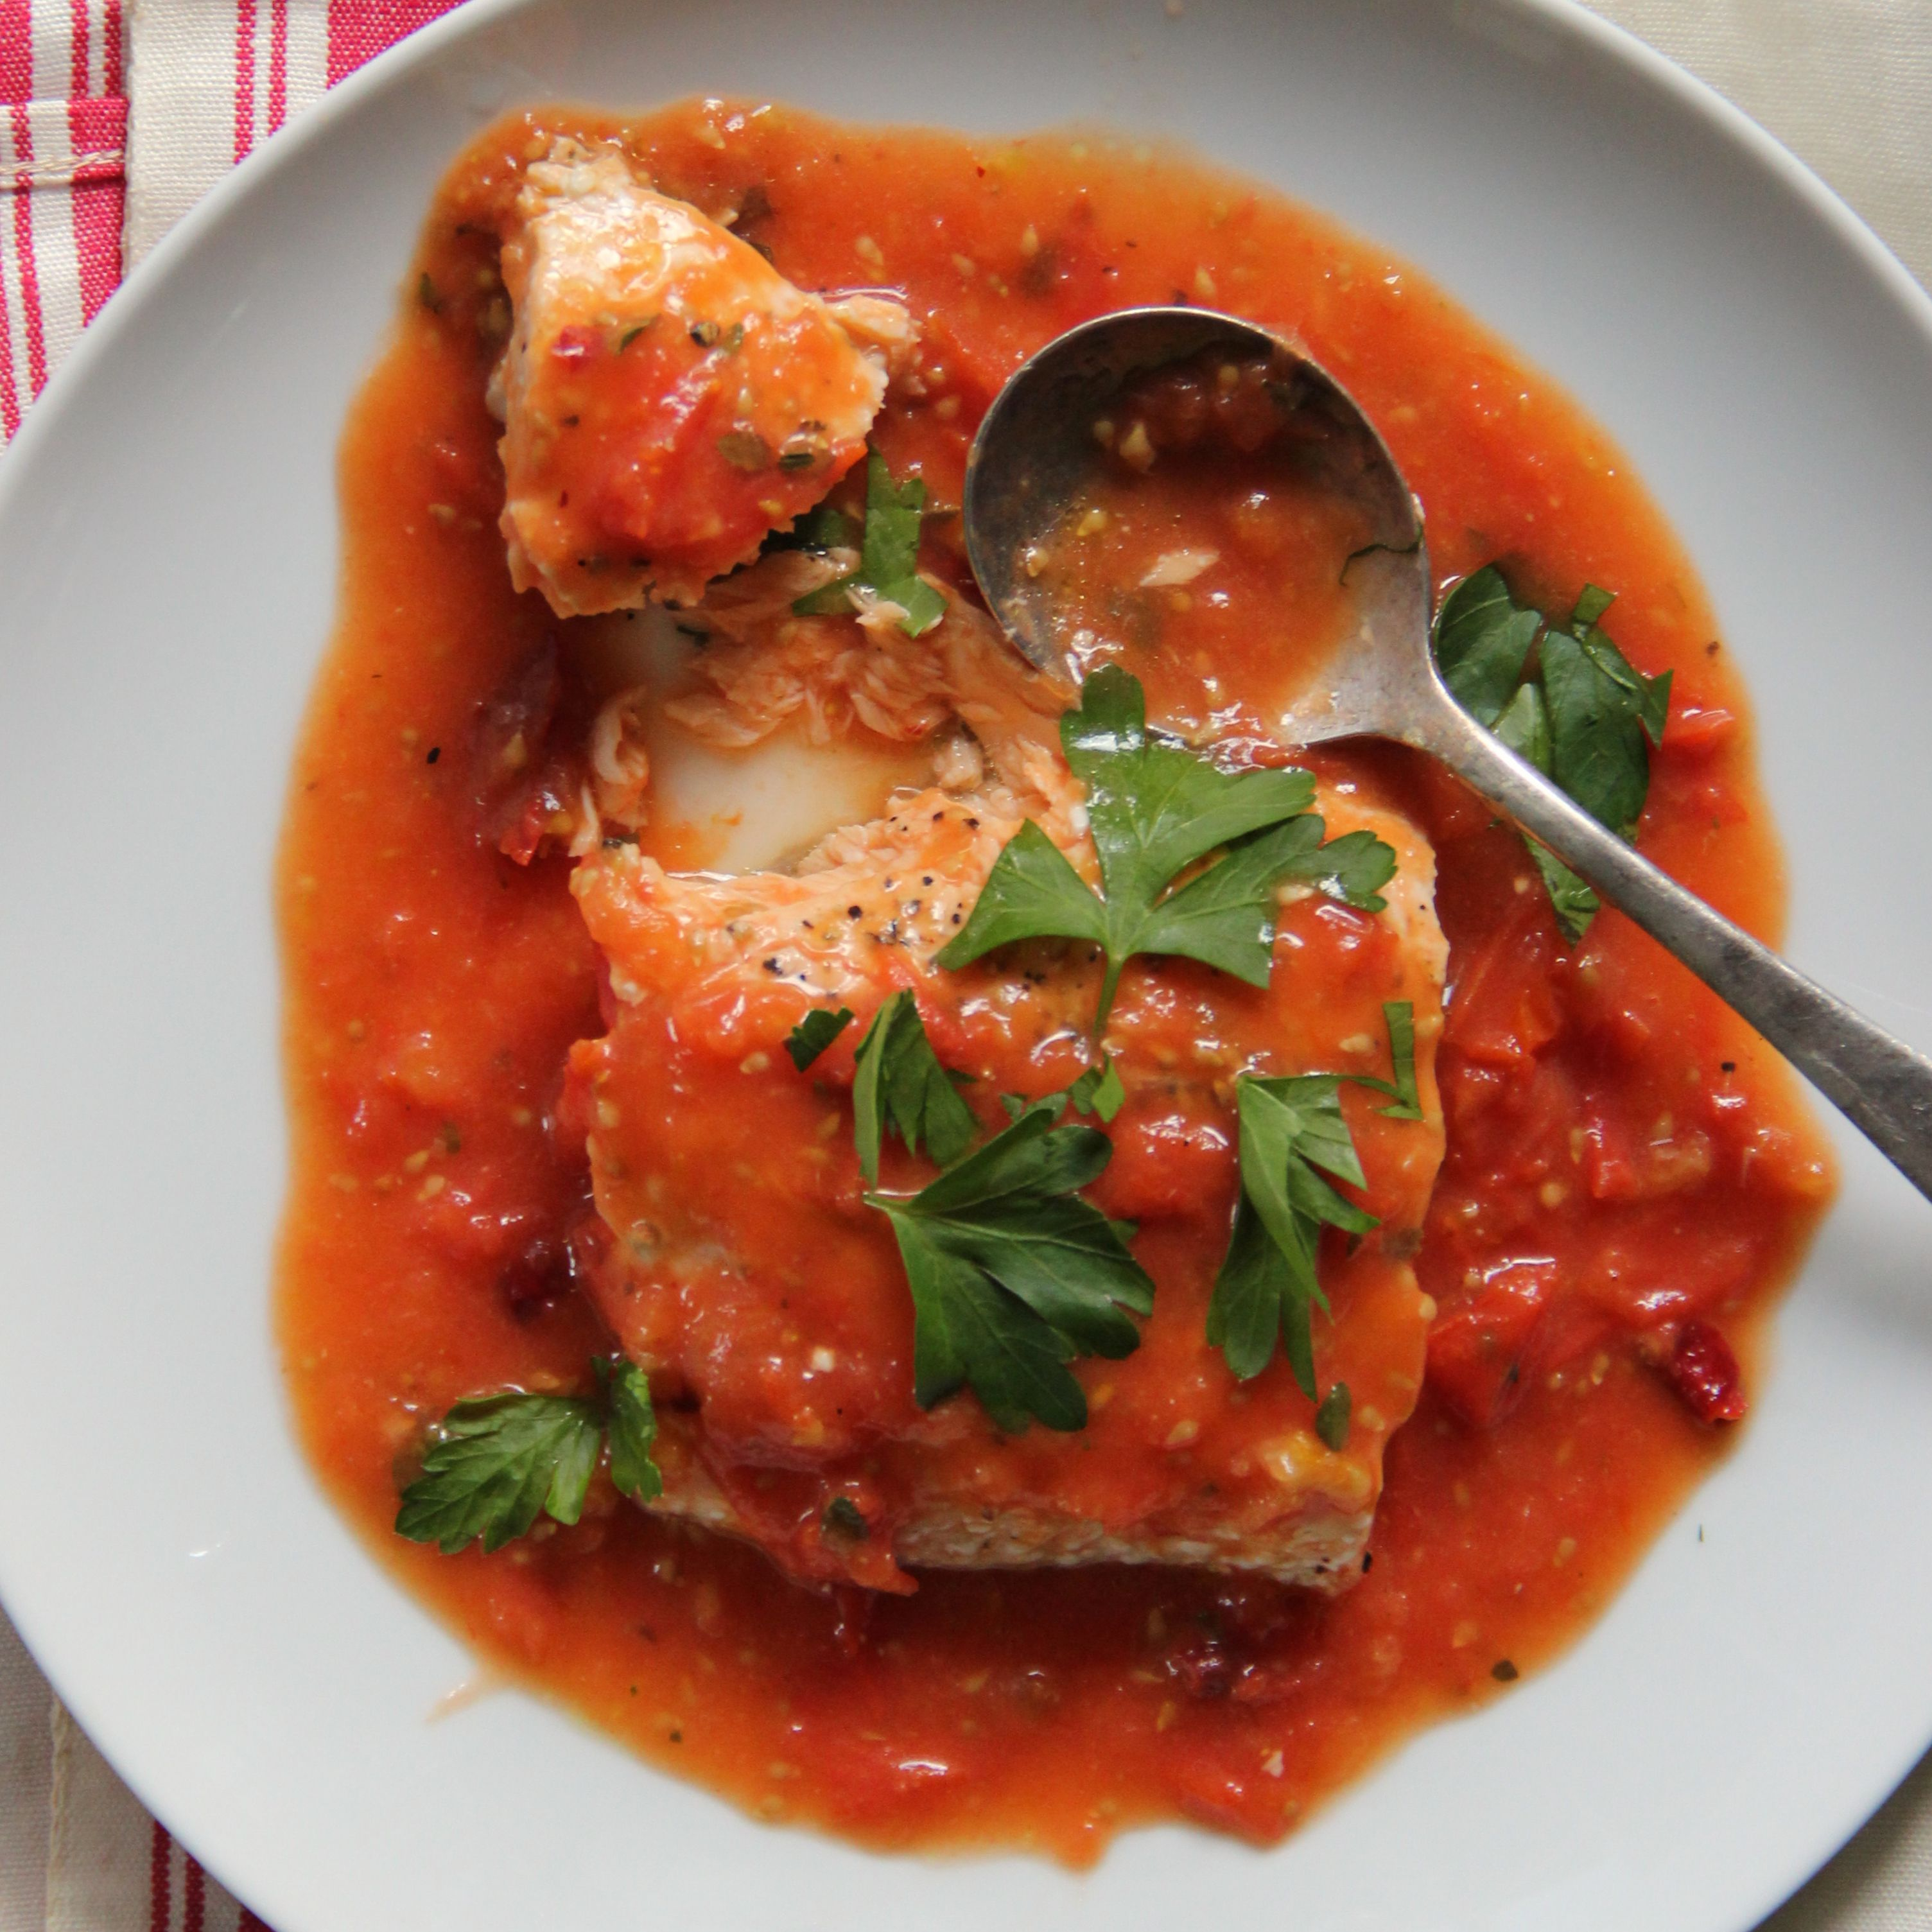 Slow Baked Salmon In Fresh Tomato Sauce Recipe Salmon Recipes Baked Salmon Recipes Baked Salmon